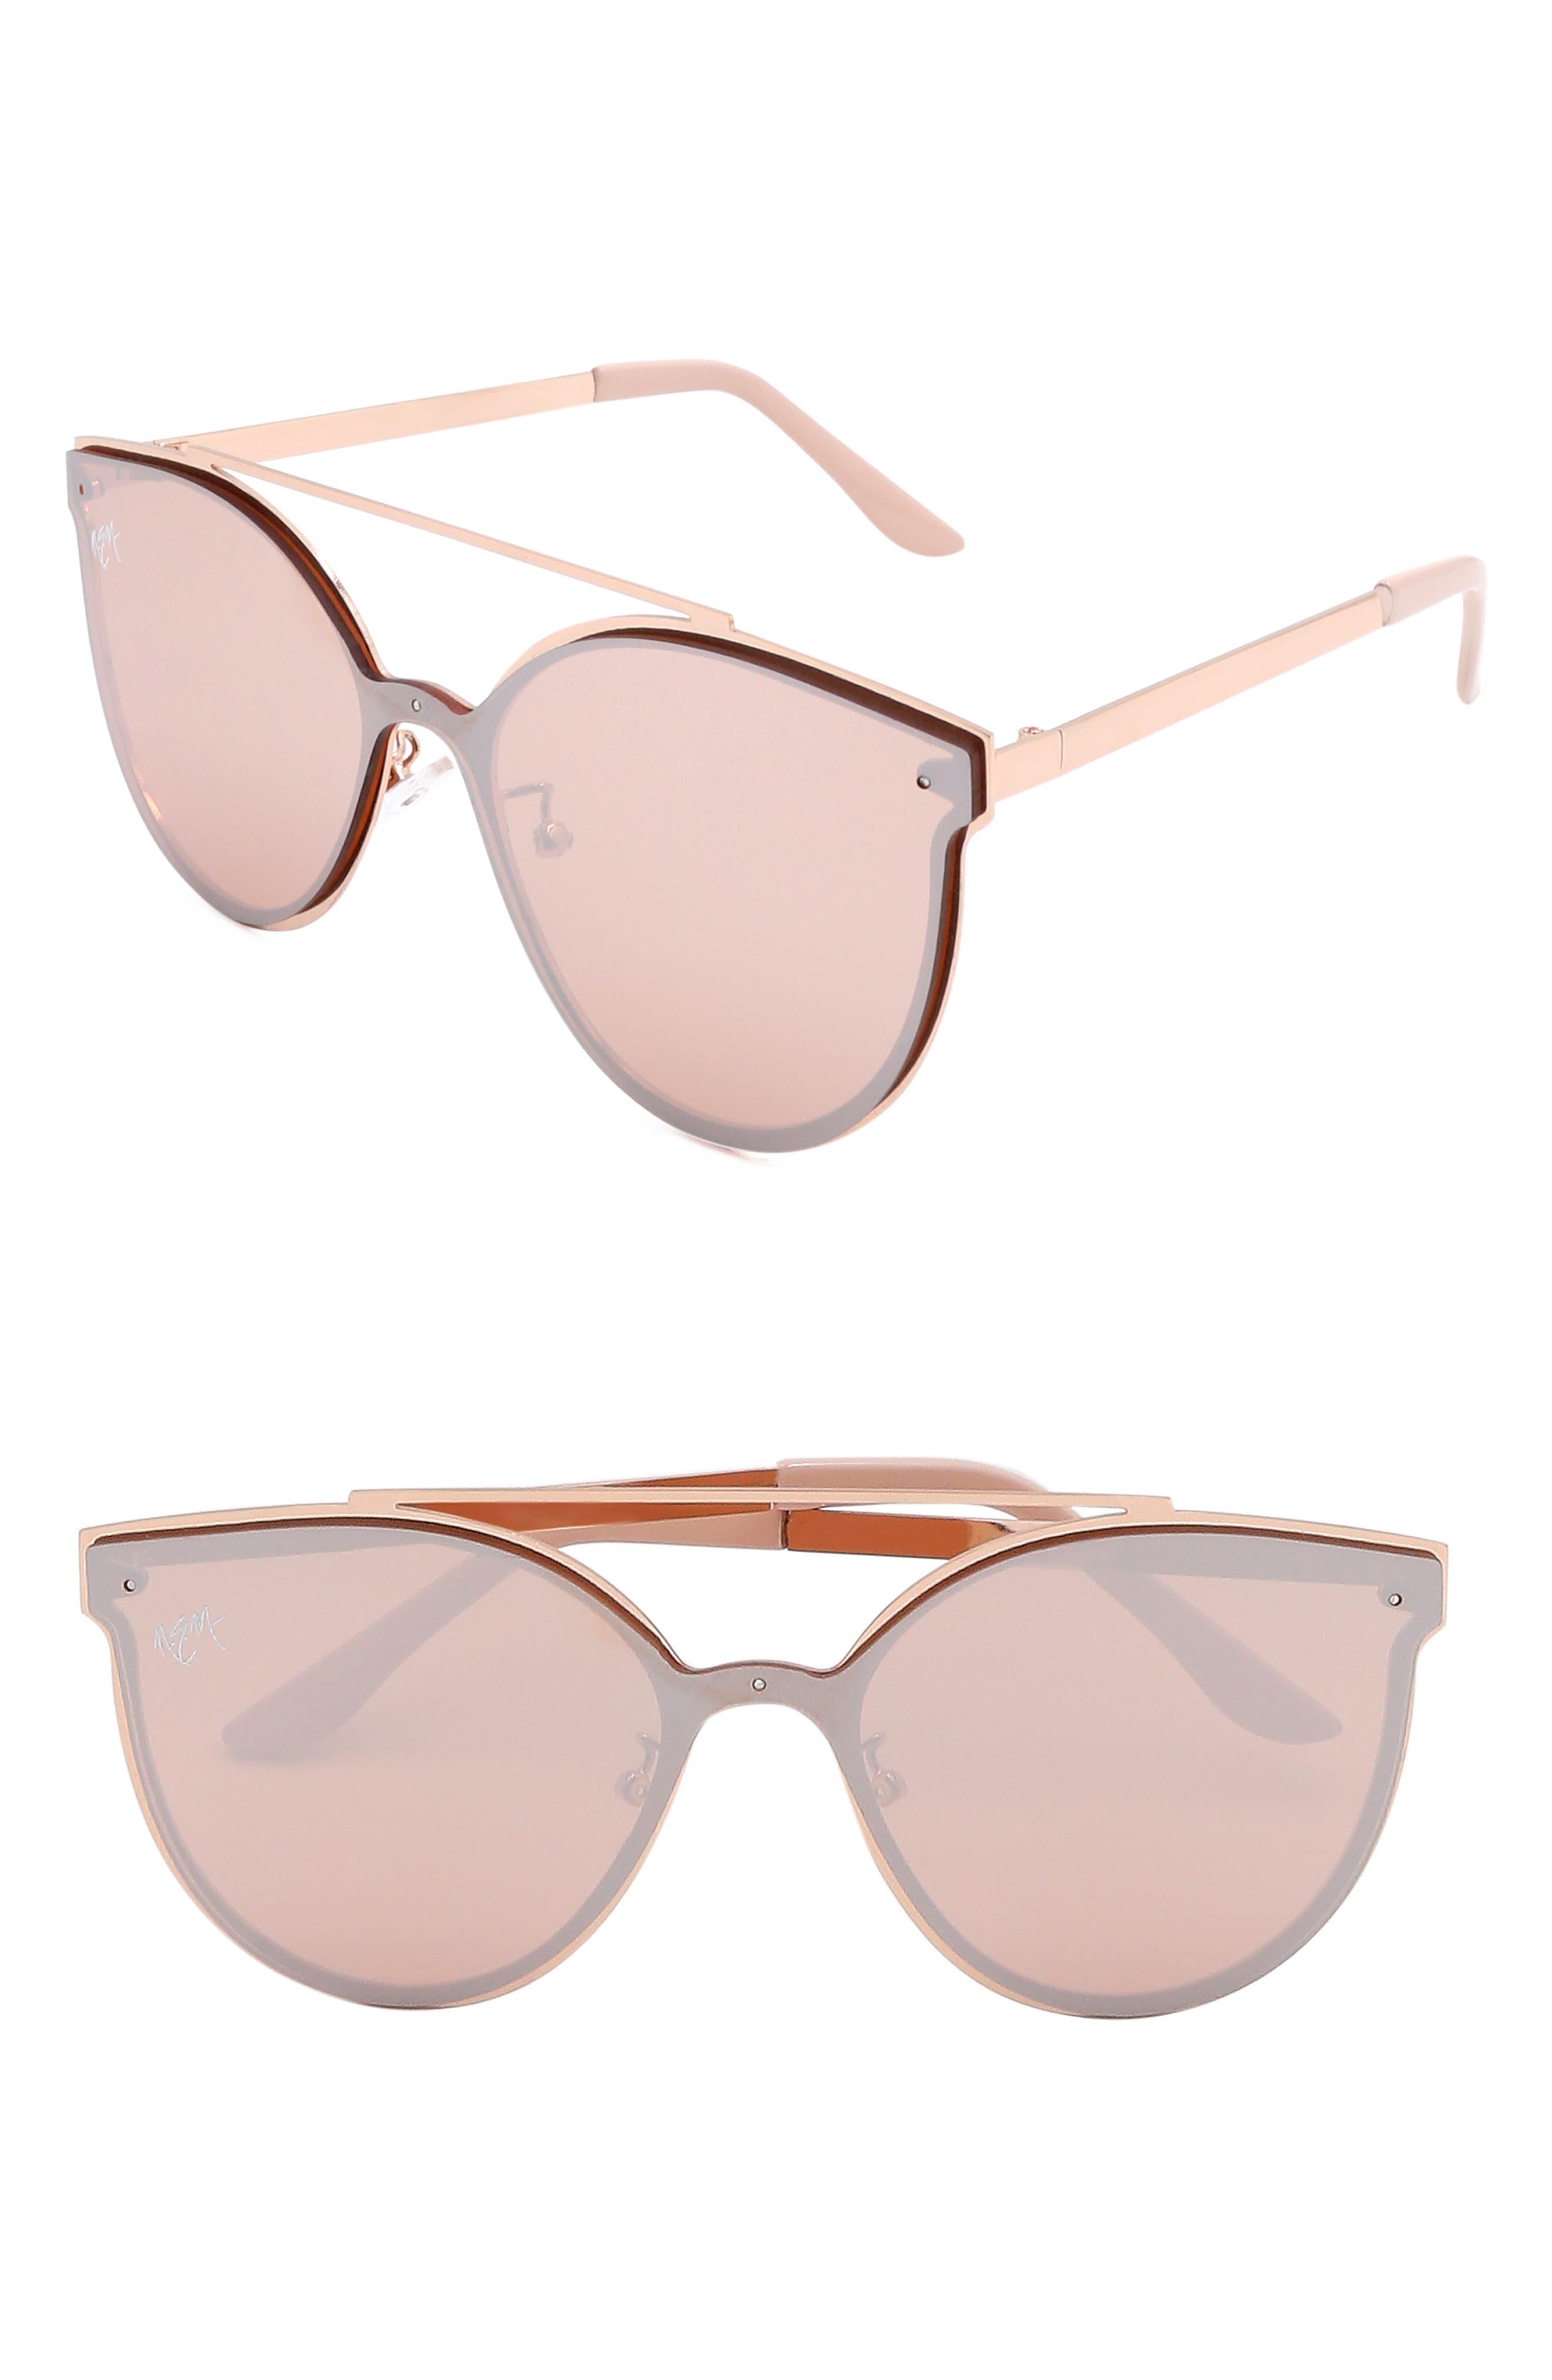 Nem Matisse 55Mm Cat Eye Sunglasses - Brown W Gold Tinted Lens